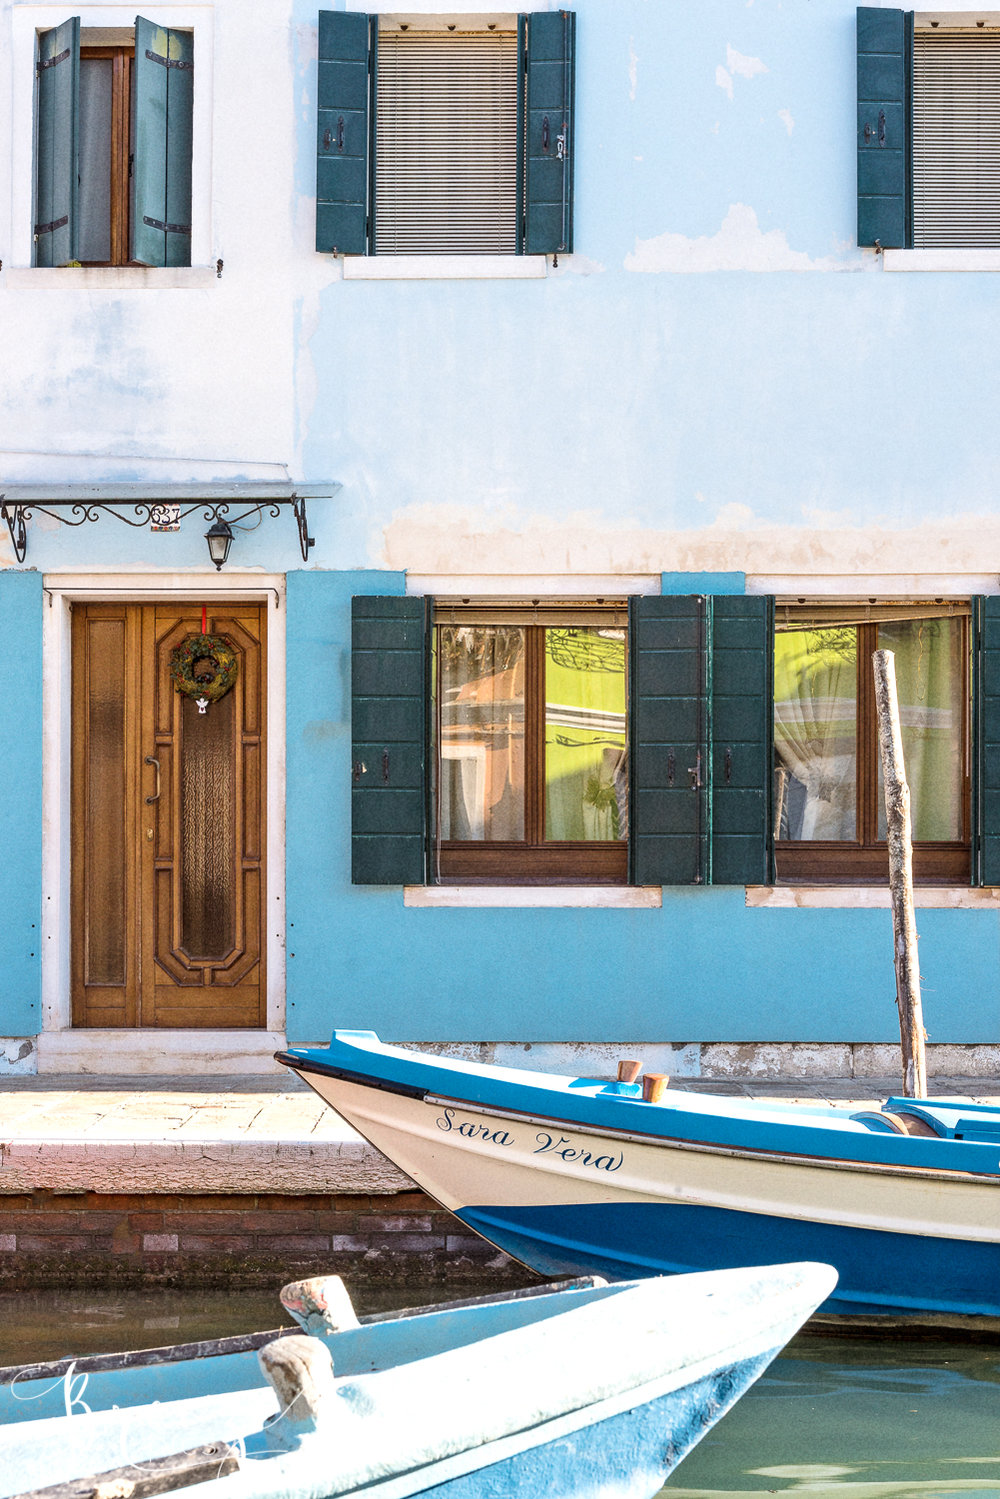 Blue_House_Burano-Ed.jpg